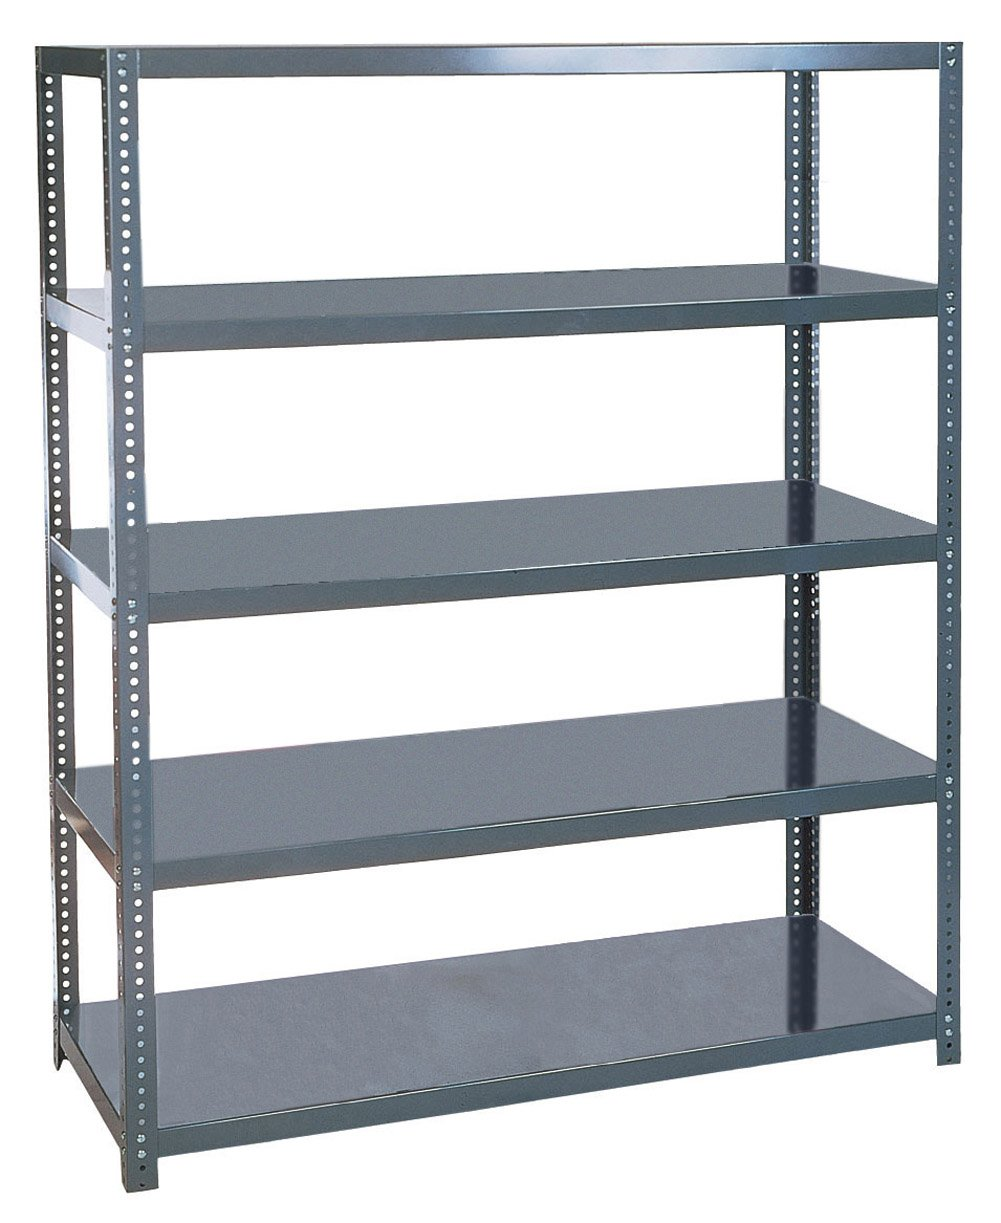 edsal shelving assembly instructions